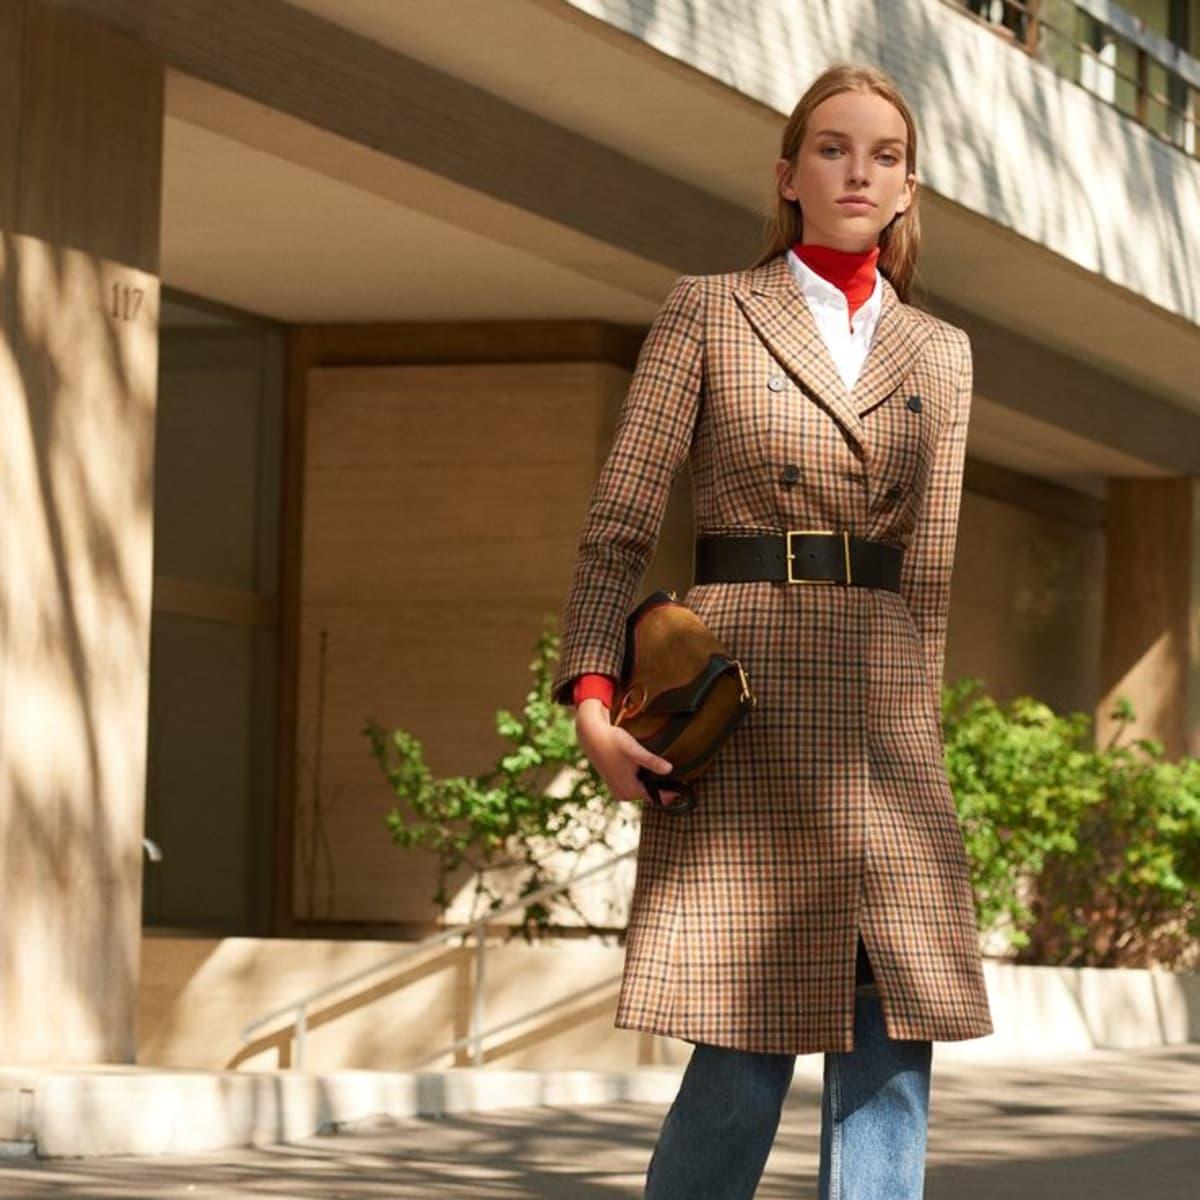 Sandro women's coat Paris checked pattern